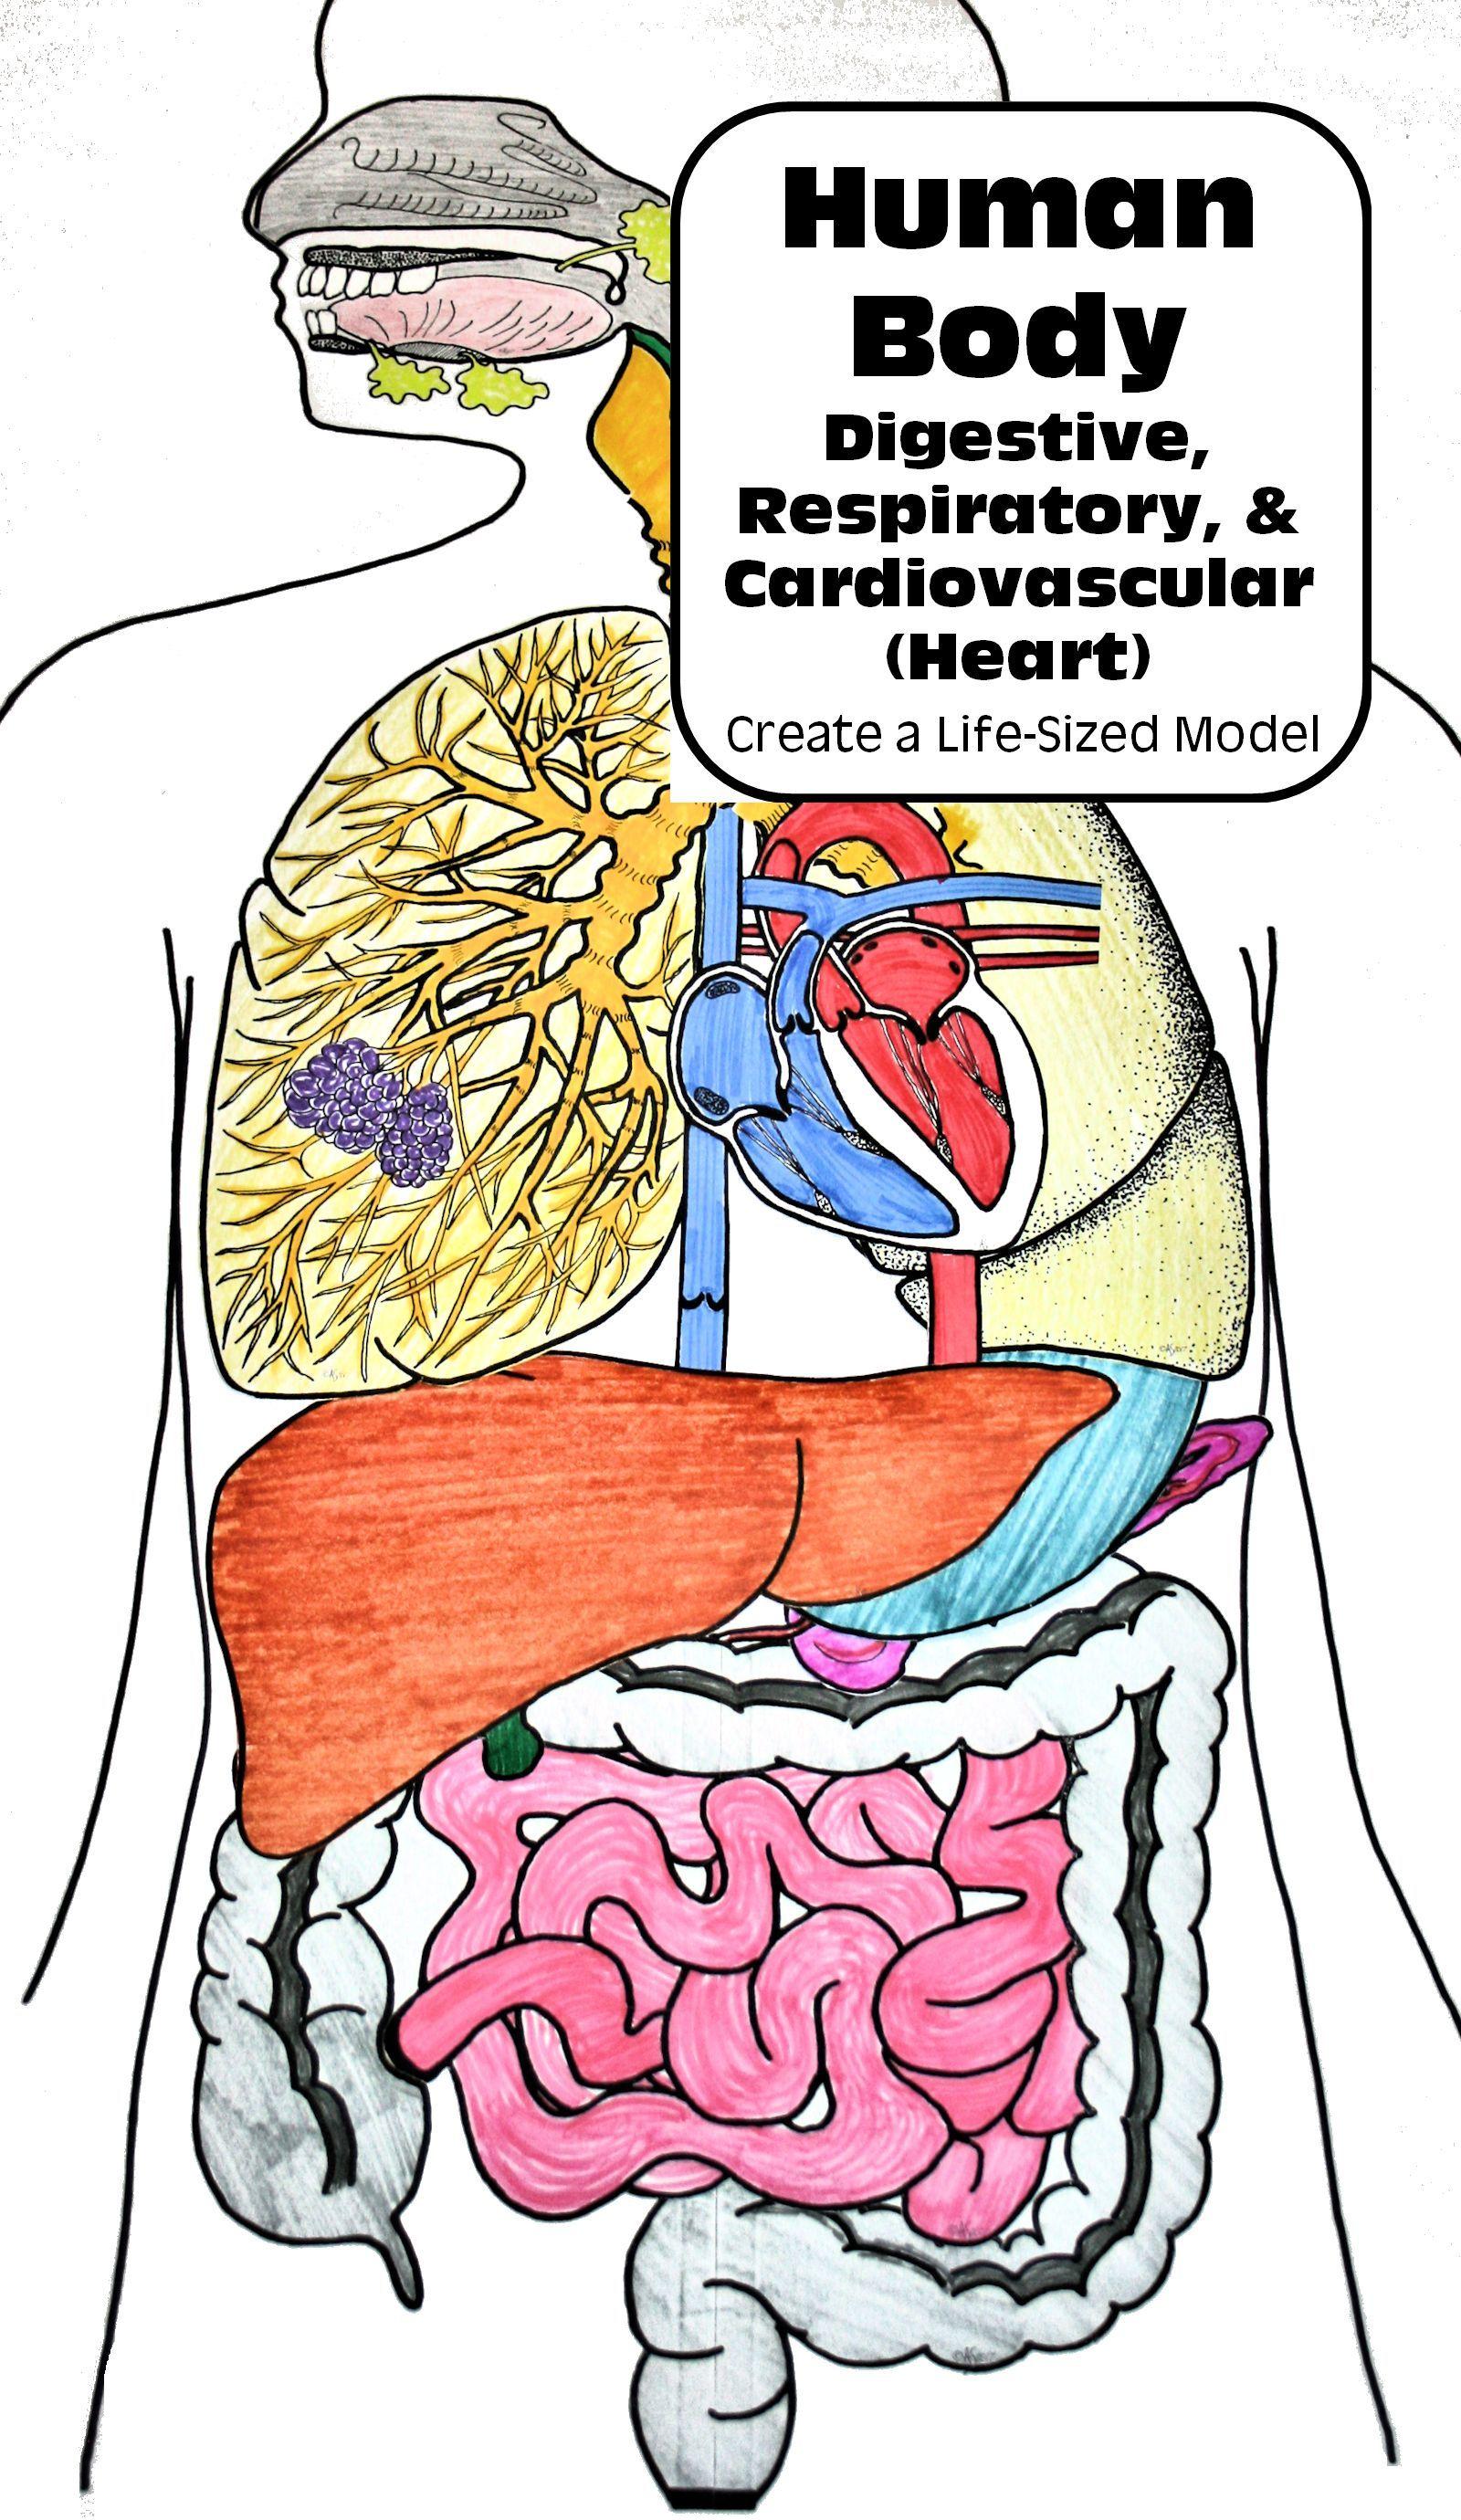 Human Body Systems Life-Sized: Digestive, Respiratory ...